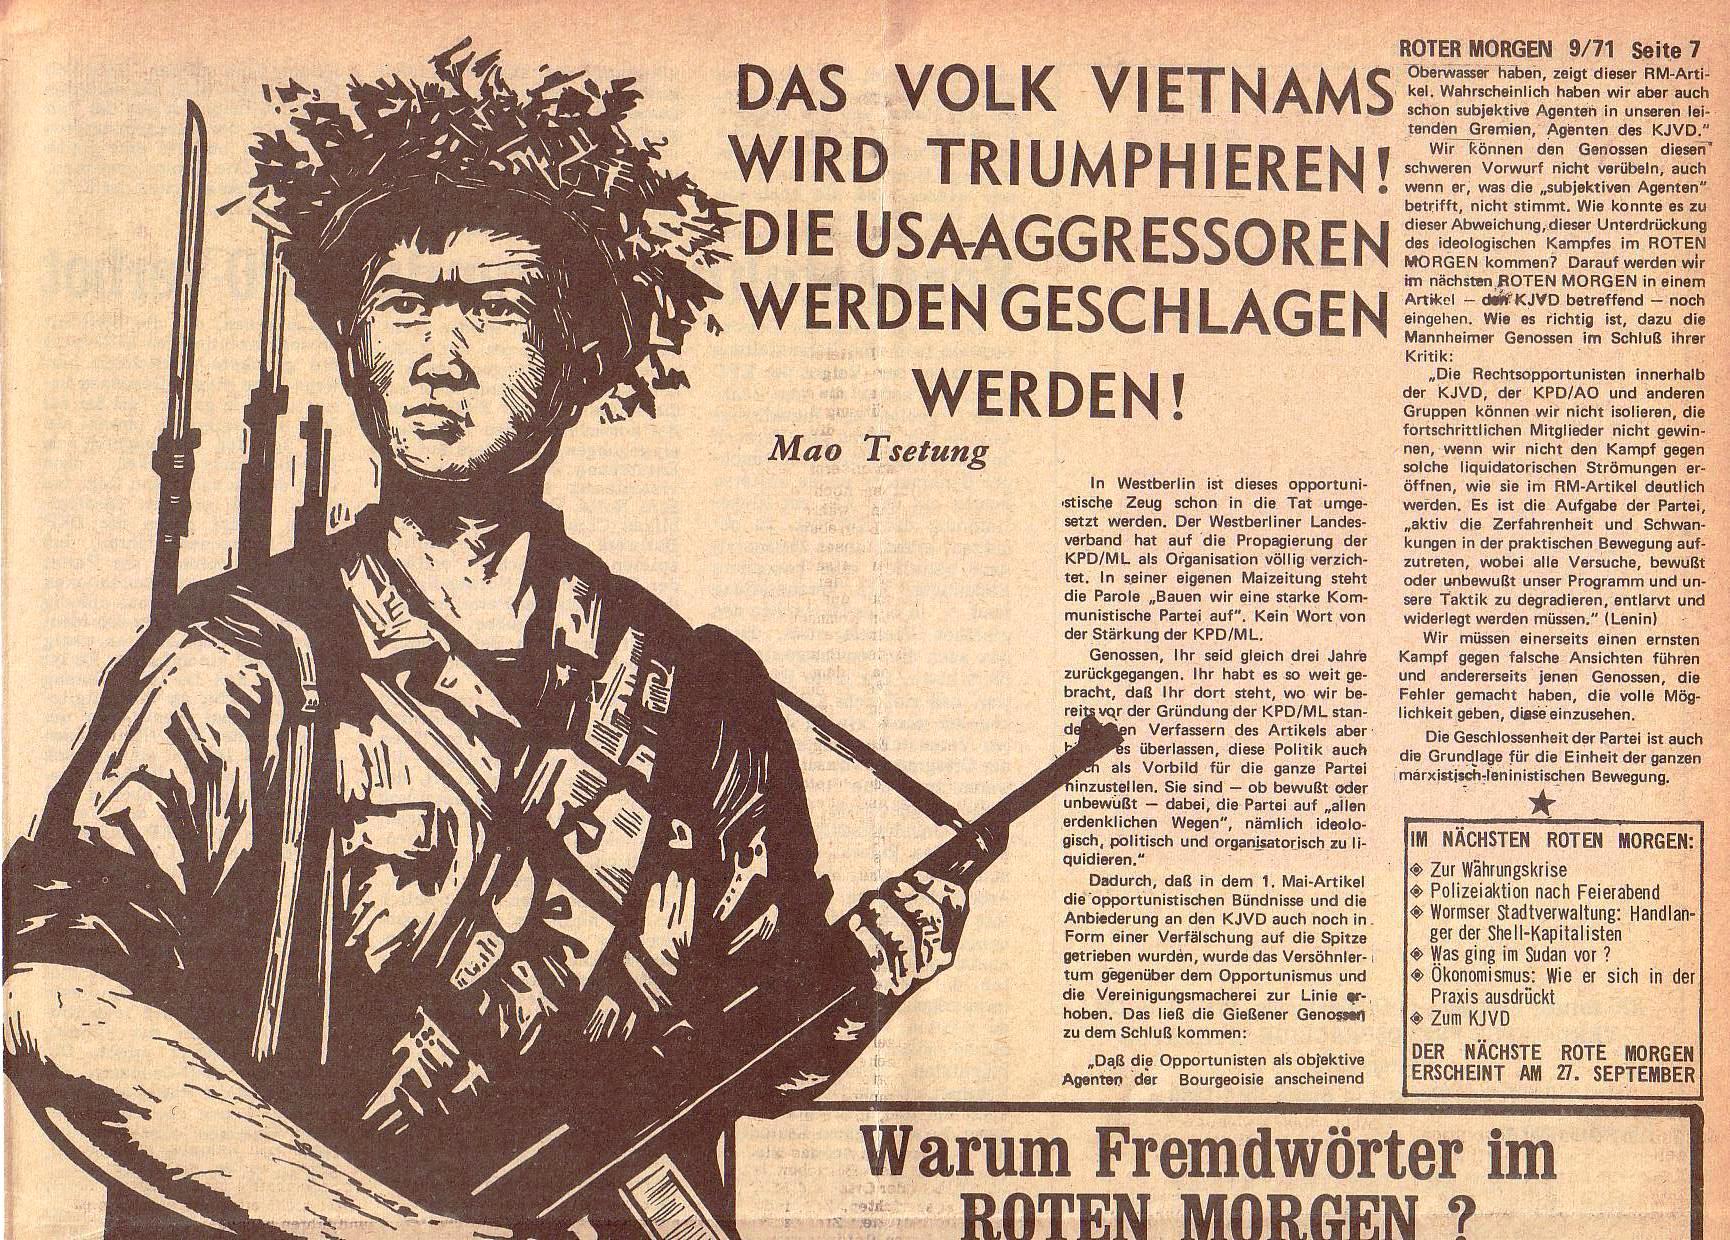 Roter Morgen, 5. Jg., 13. September 1971, Nr. 9, Seite 7a